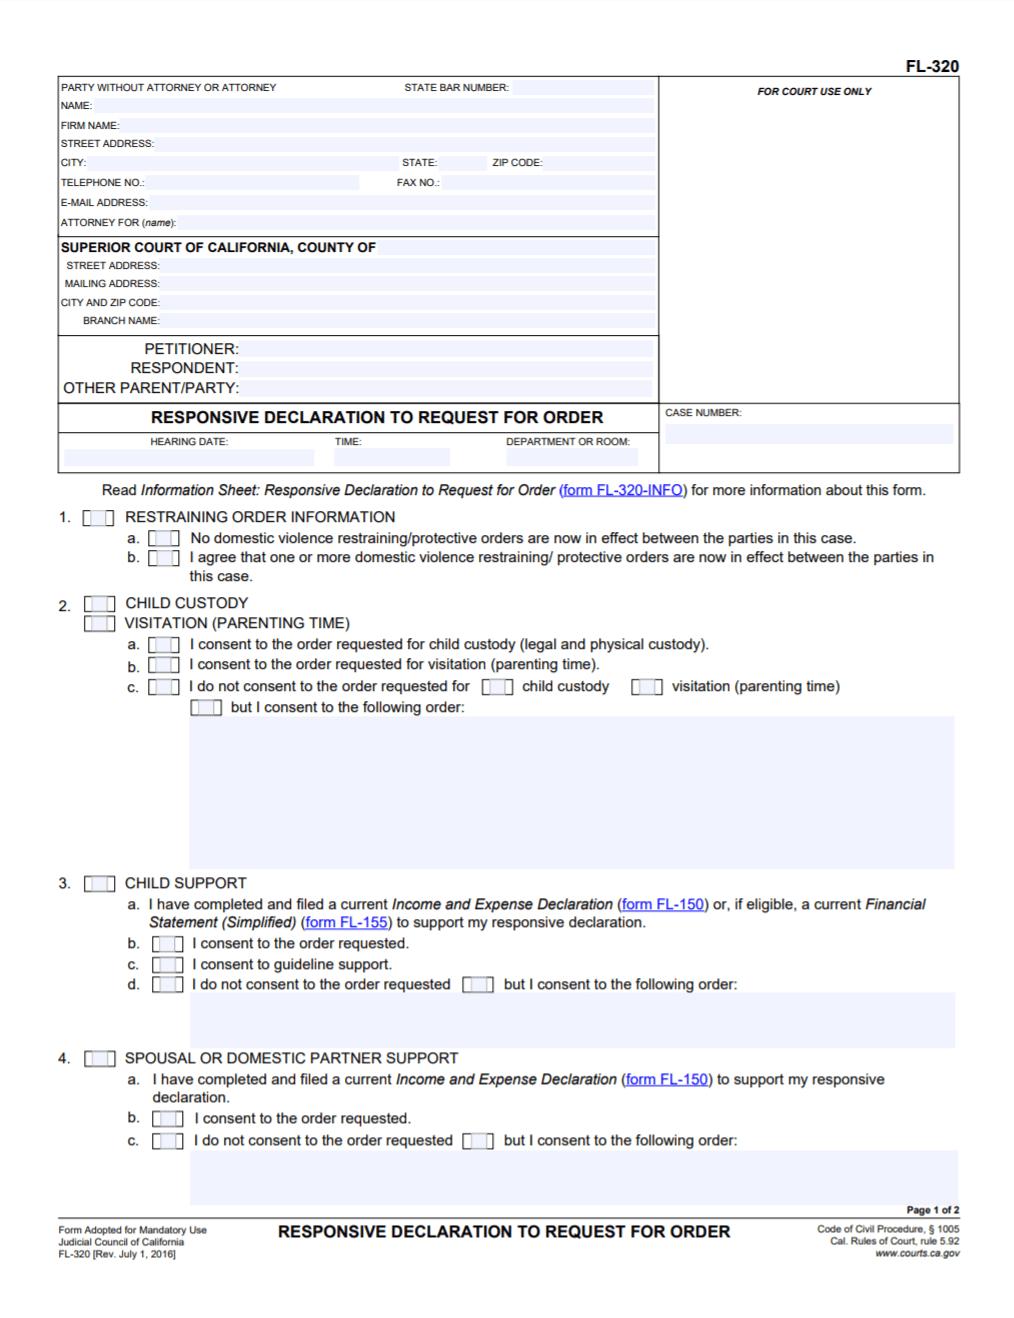 FL-320 responsive declaration